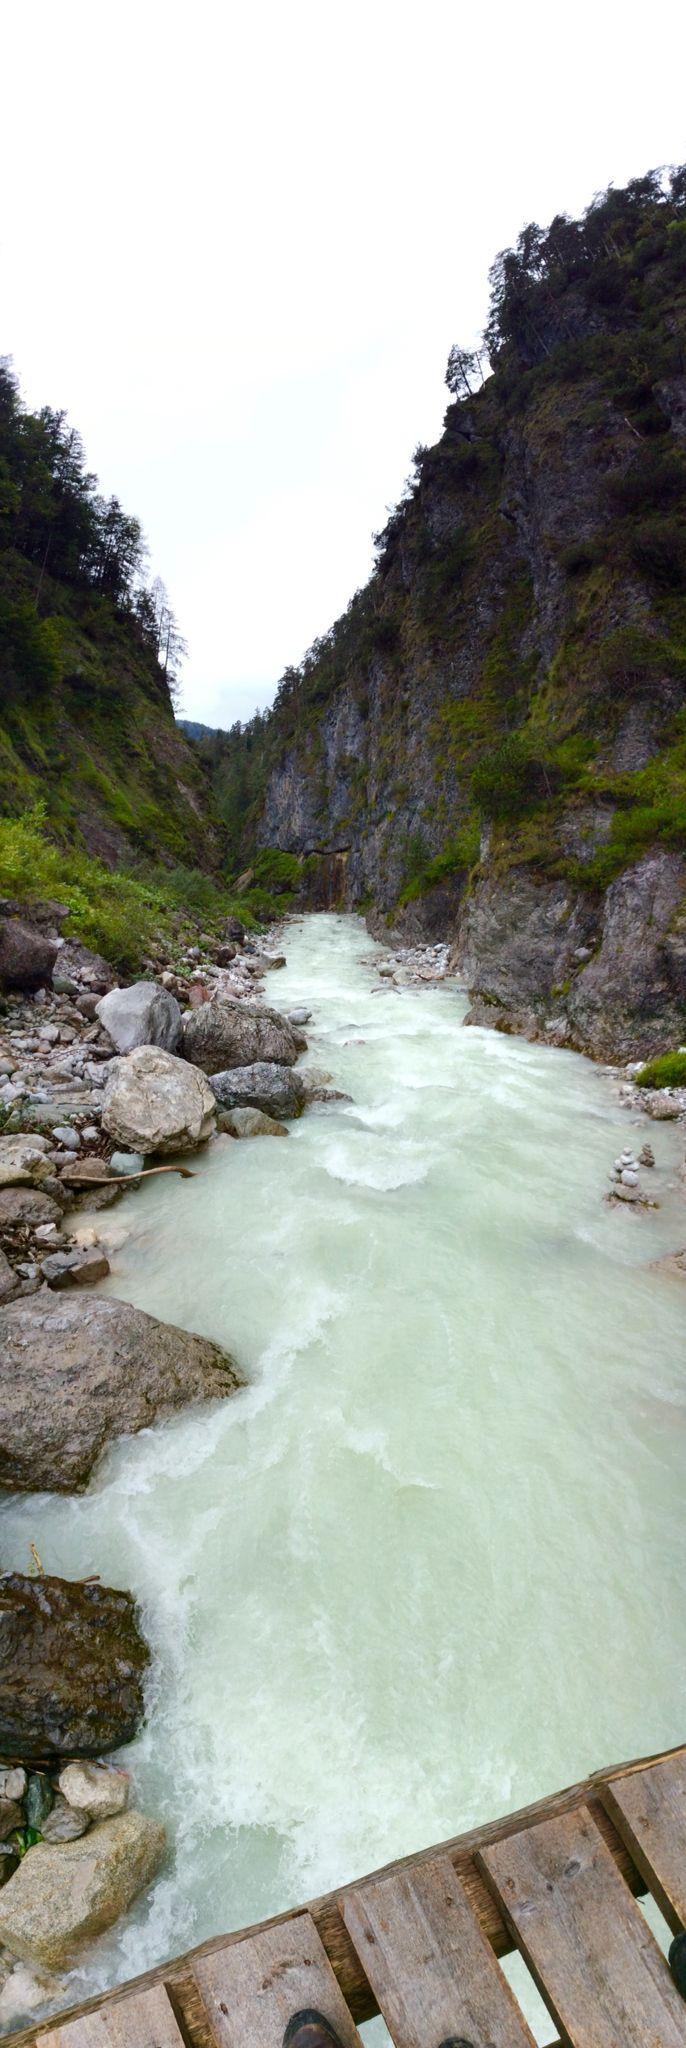 Buchmaisbach, Saalfelden, Austria, Hiking